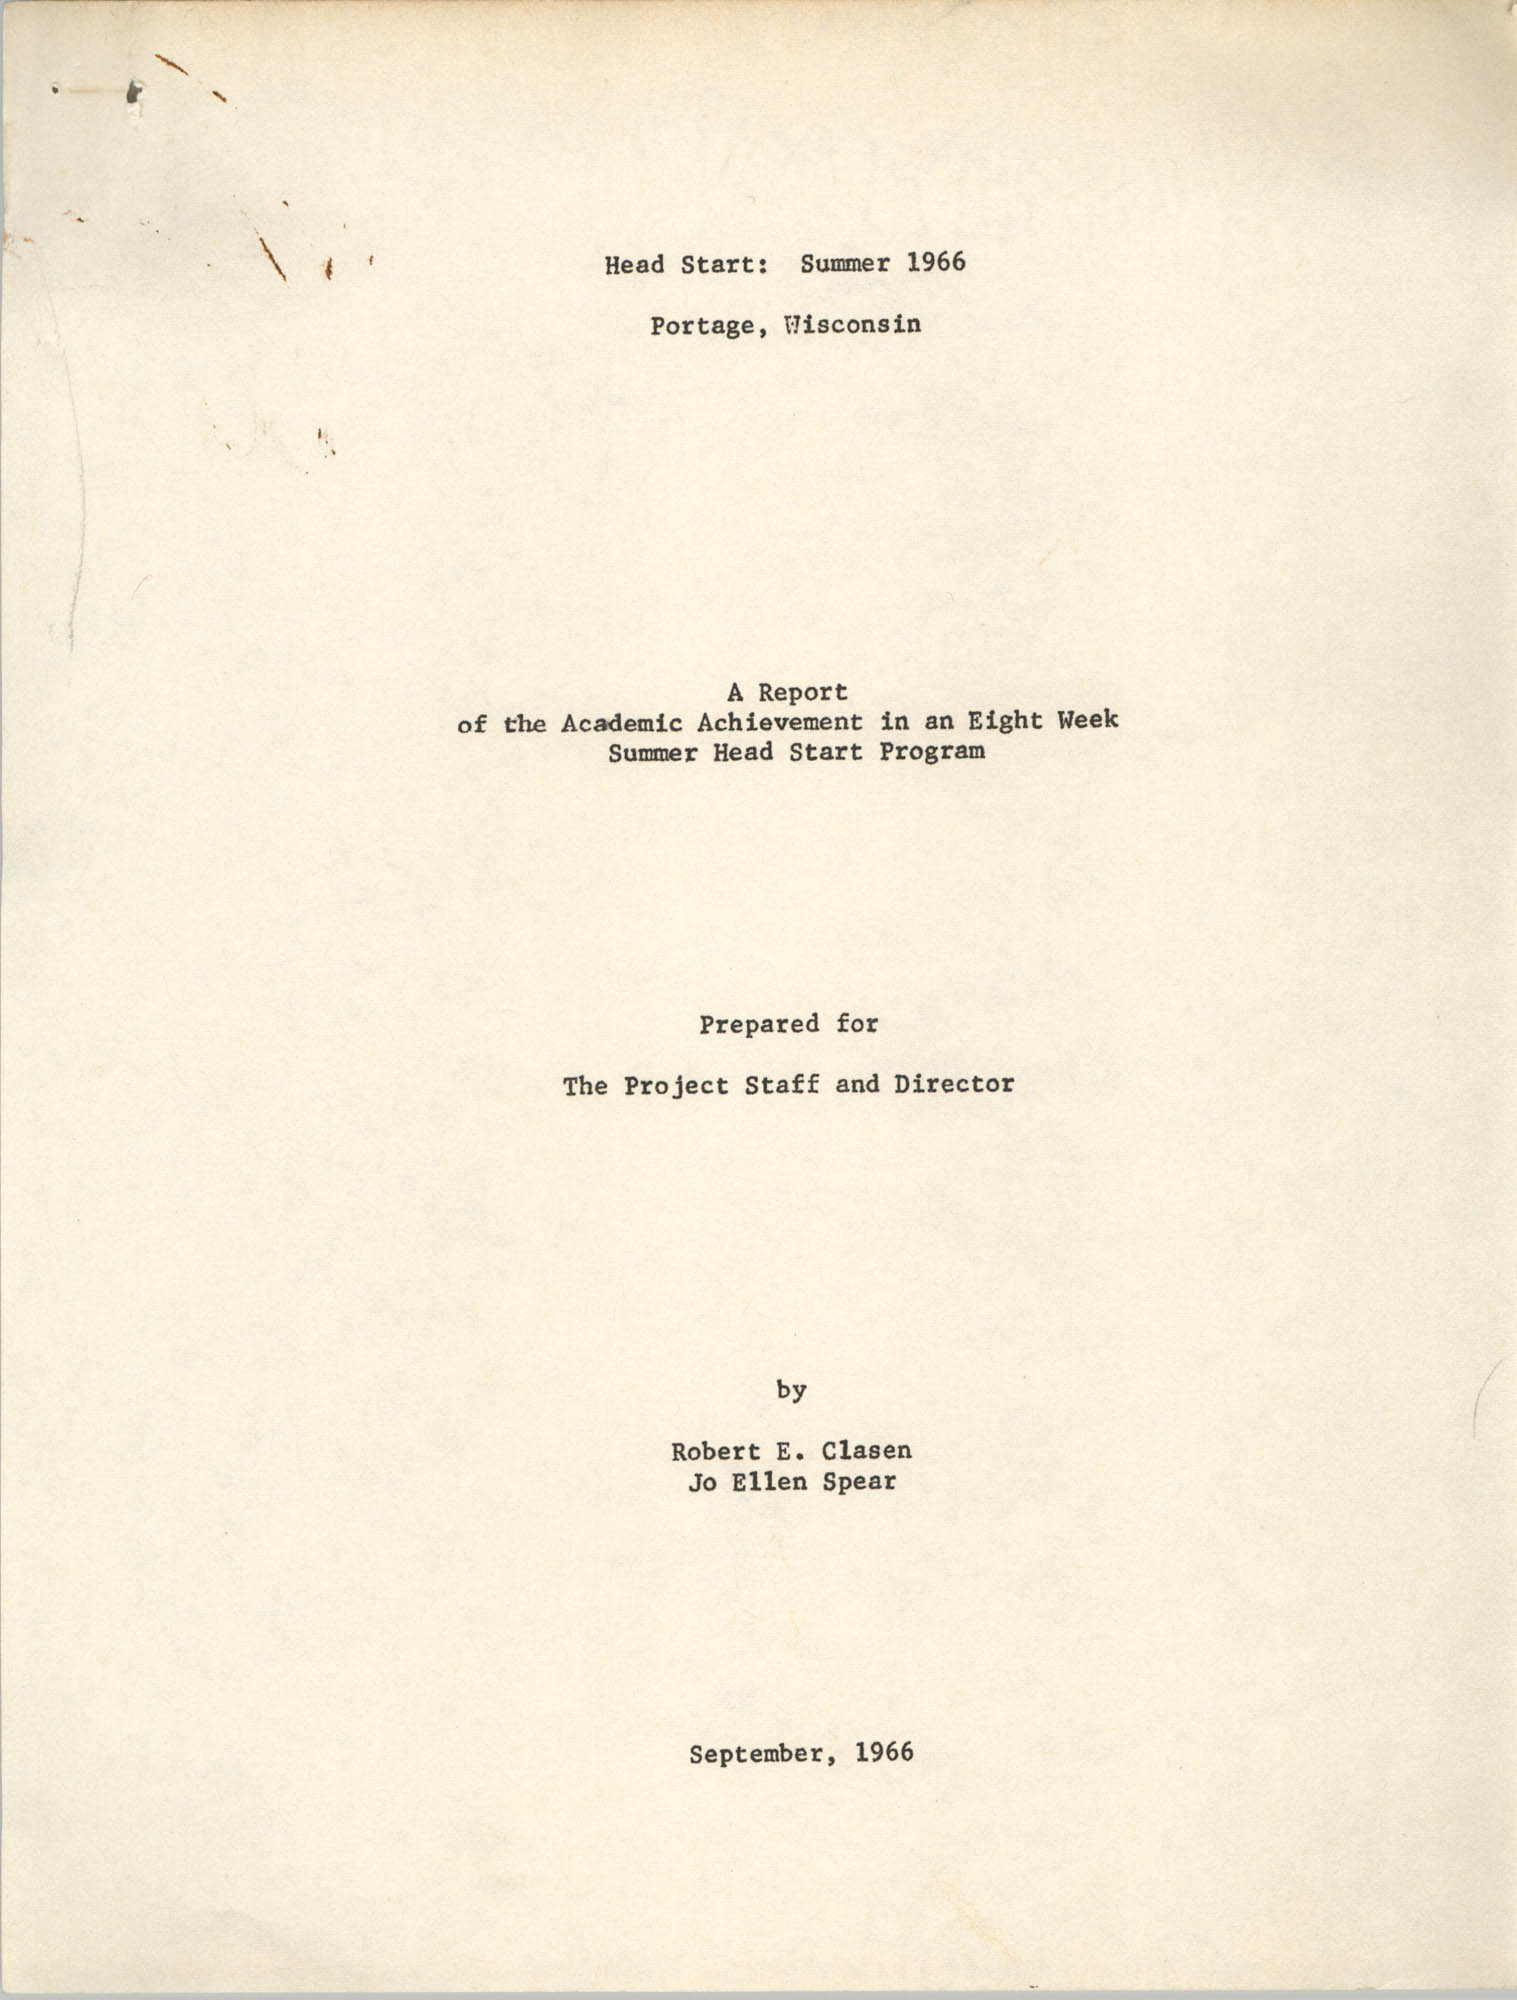 Head Start: Summer 1966